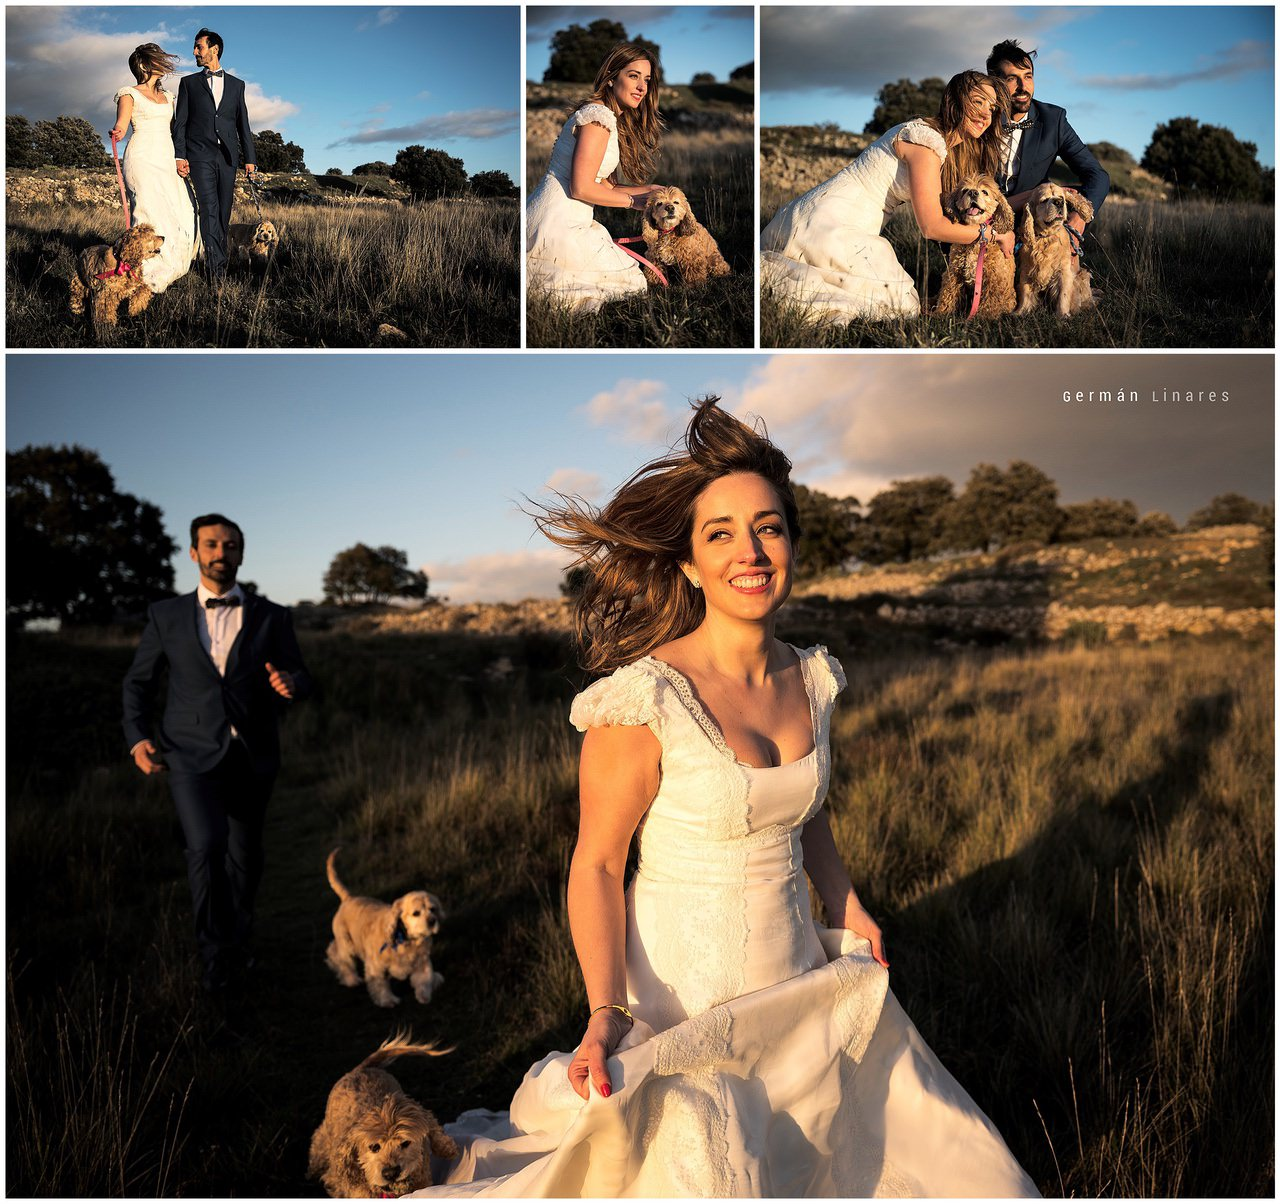 fotografo bodas alcoy noe ramon 4